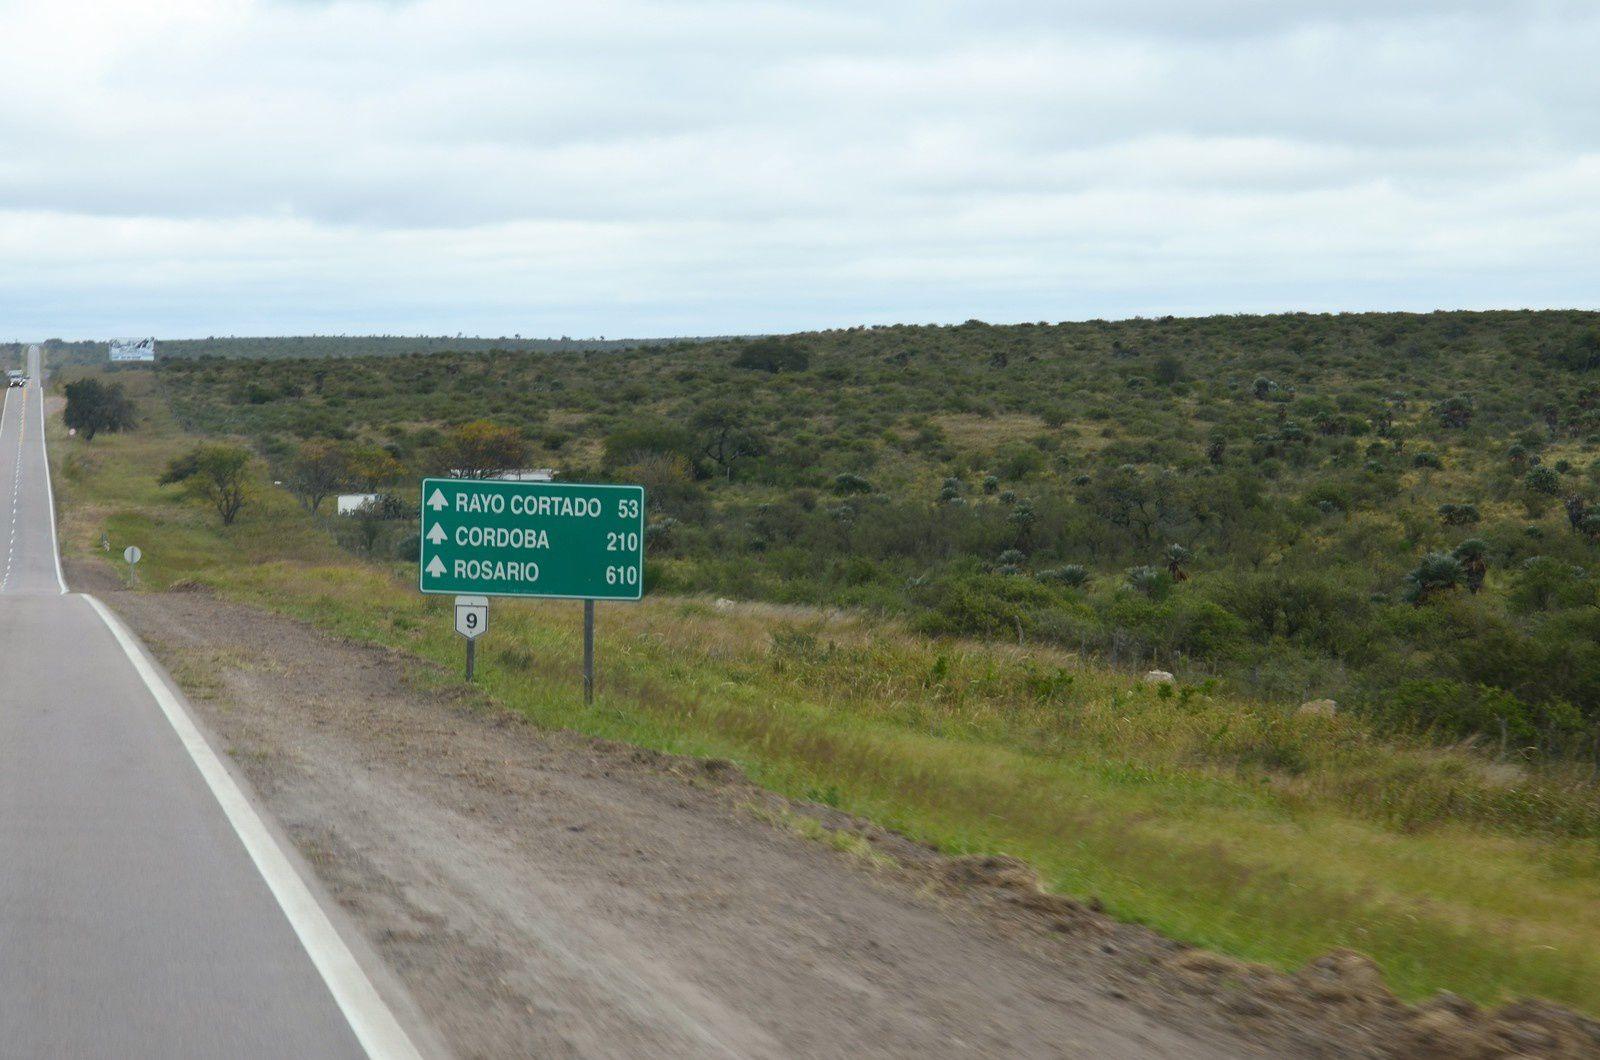 Ruta 9 Santiago del Estero-Cordoba (Argentine en camping-car)